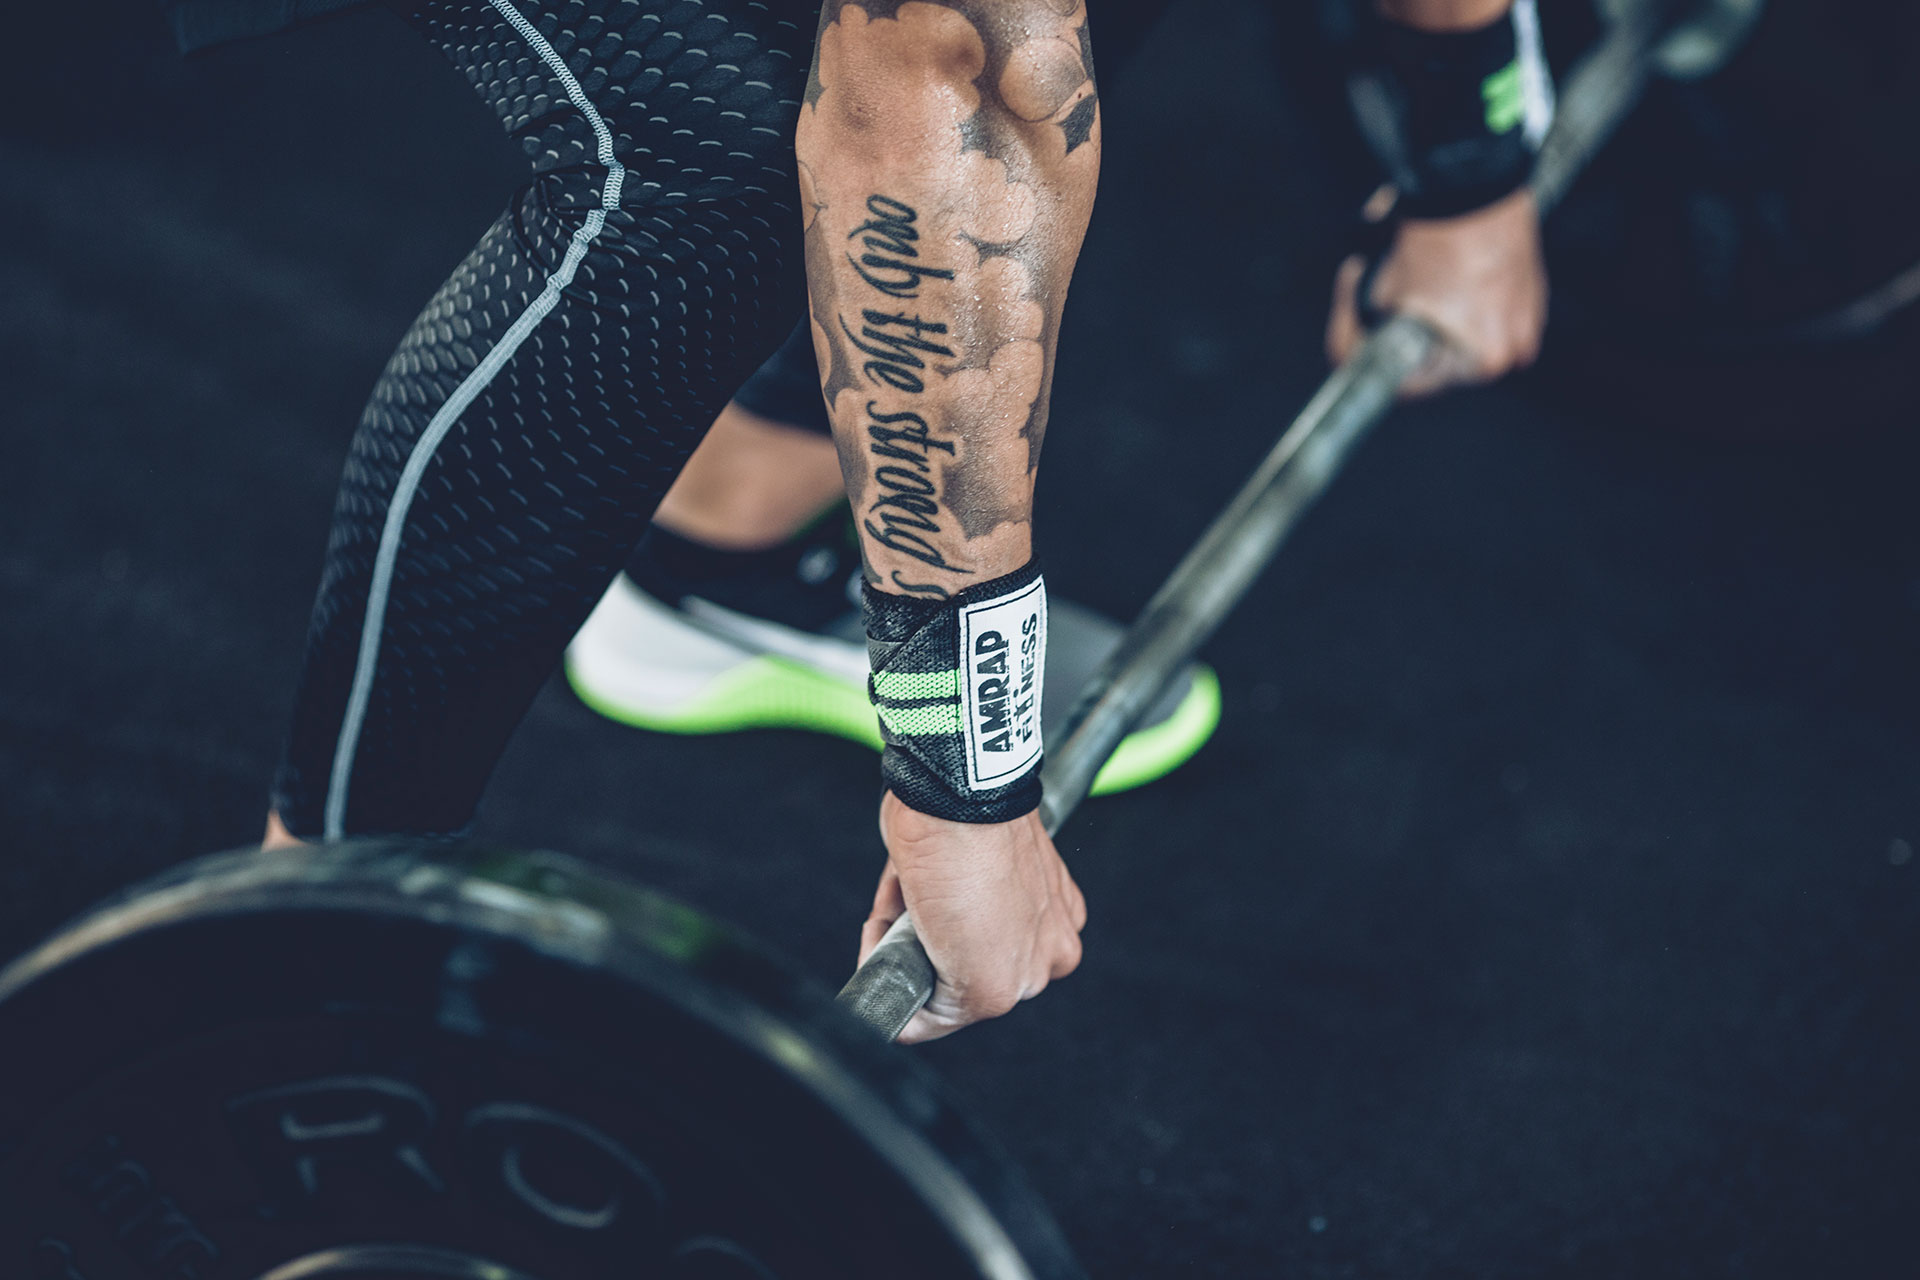 Sport Hantel Kraftsport Muskeln Crossfit Fotograf Training Fotoproduktion Werbung Salzburg